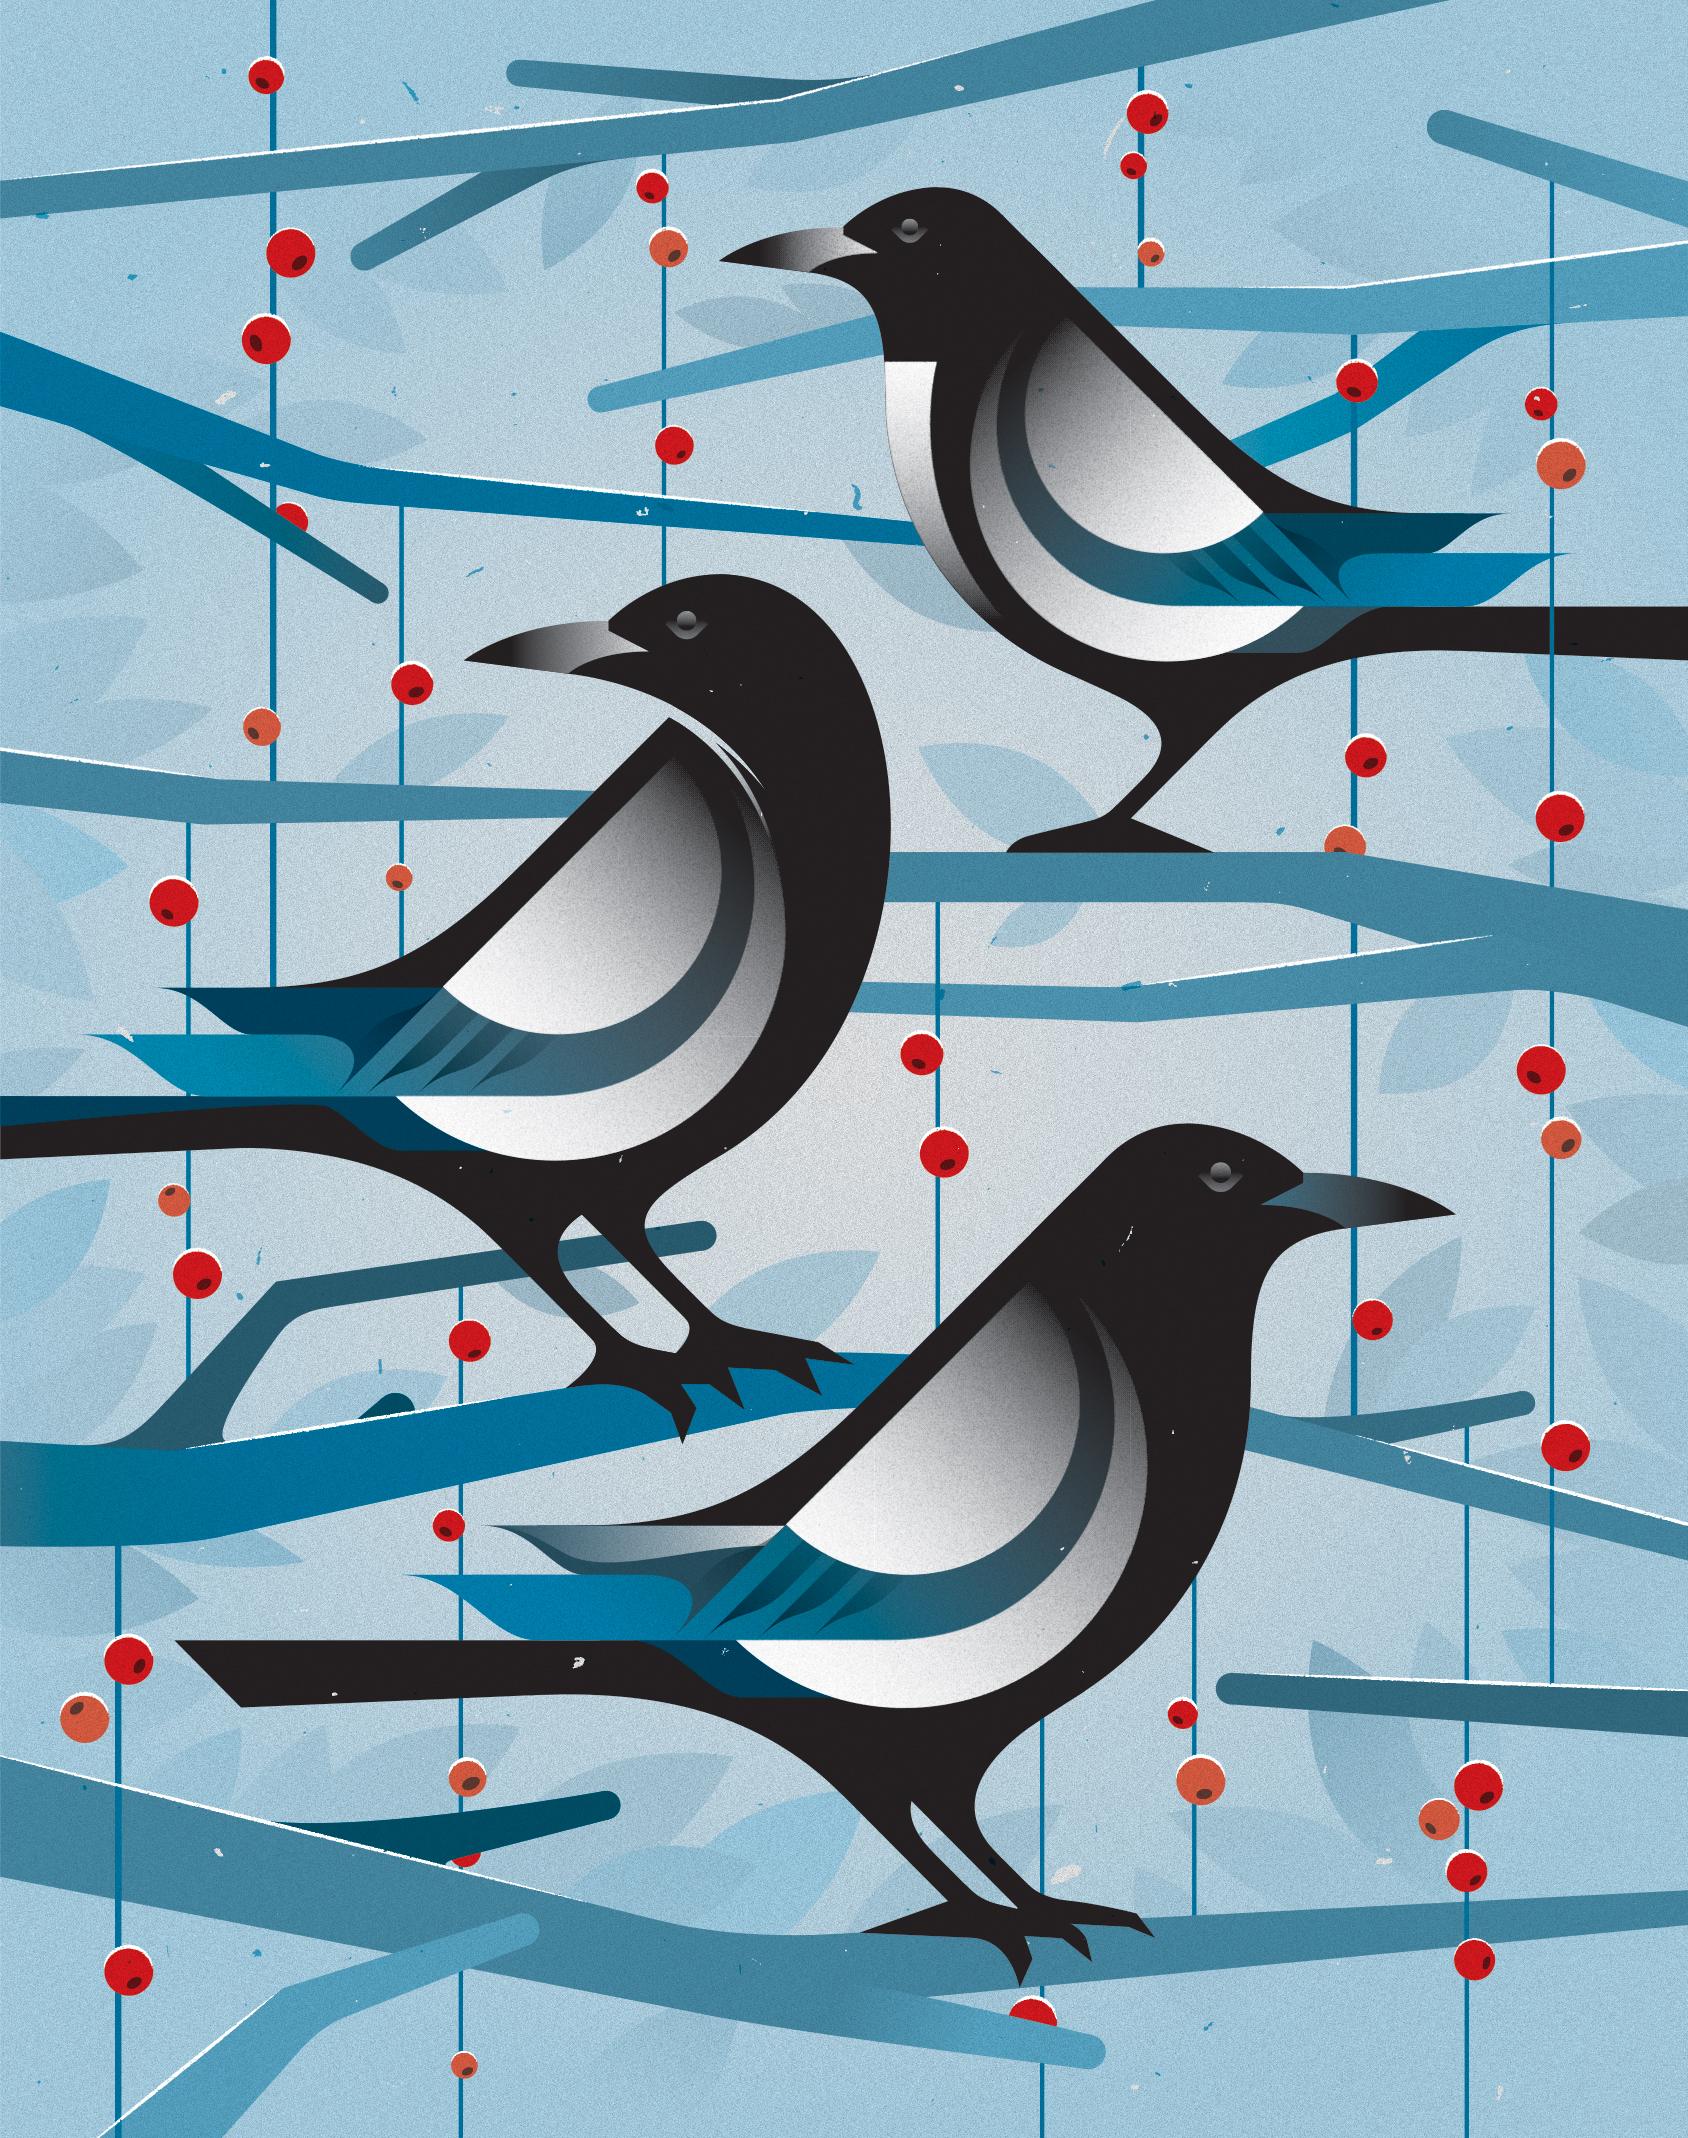 Magpies Illustration